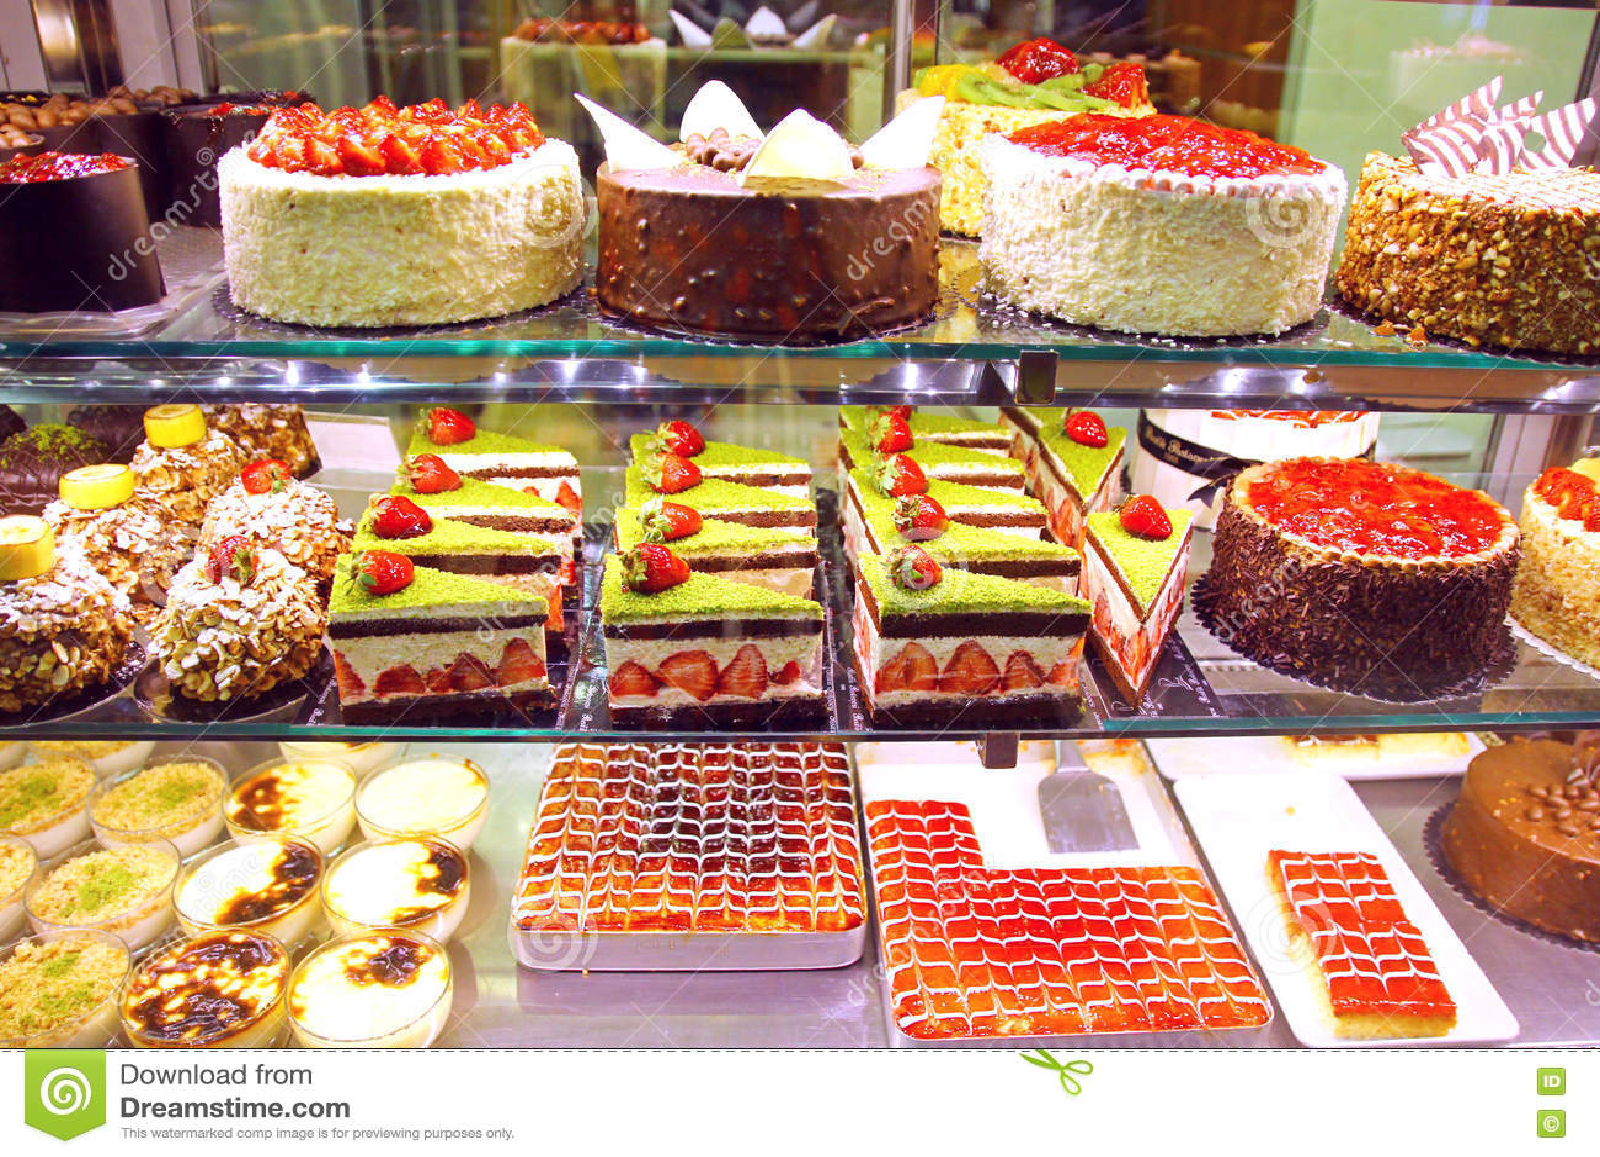 Bake And Cake London